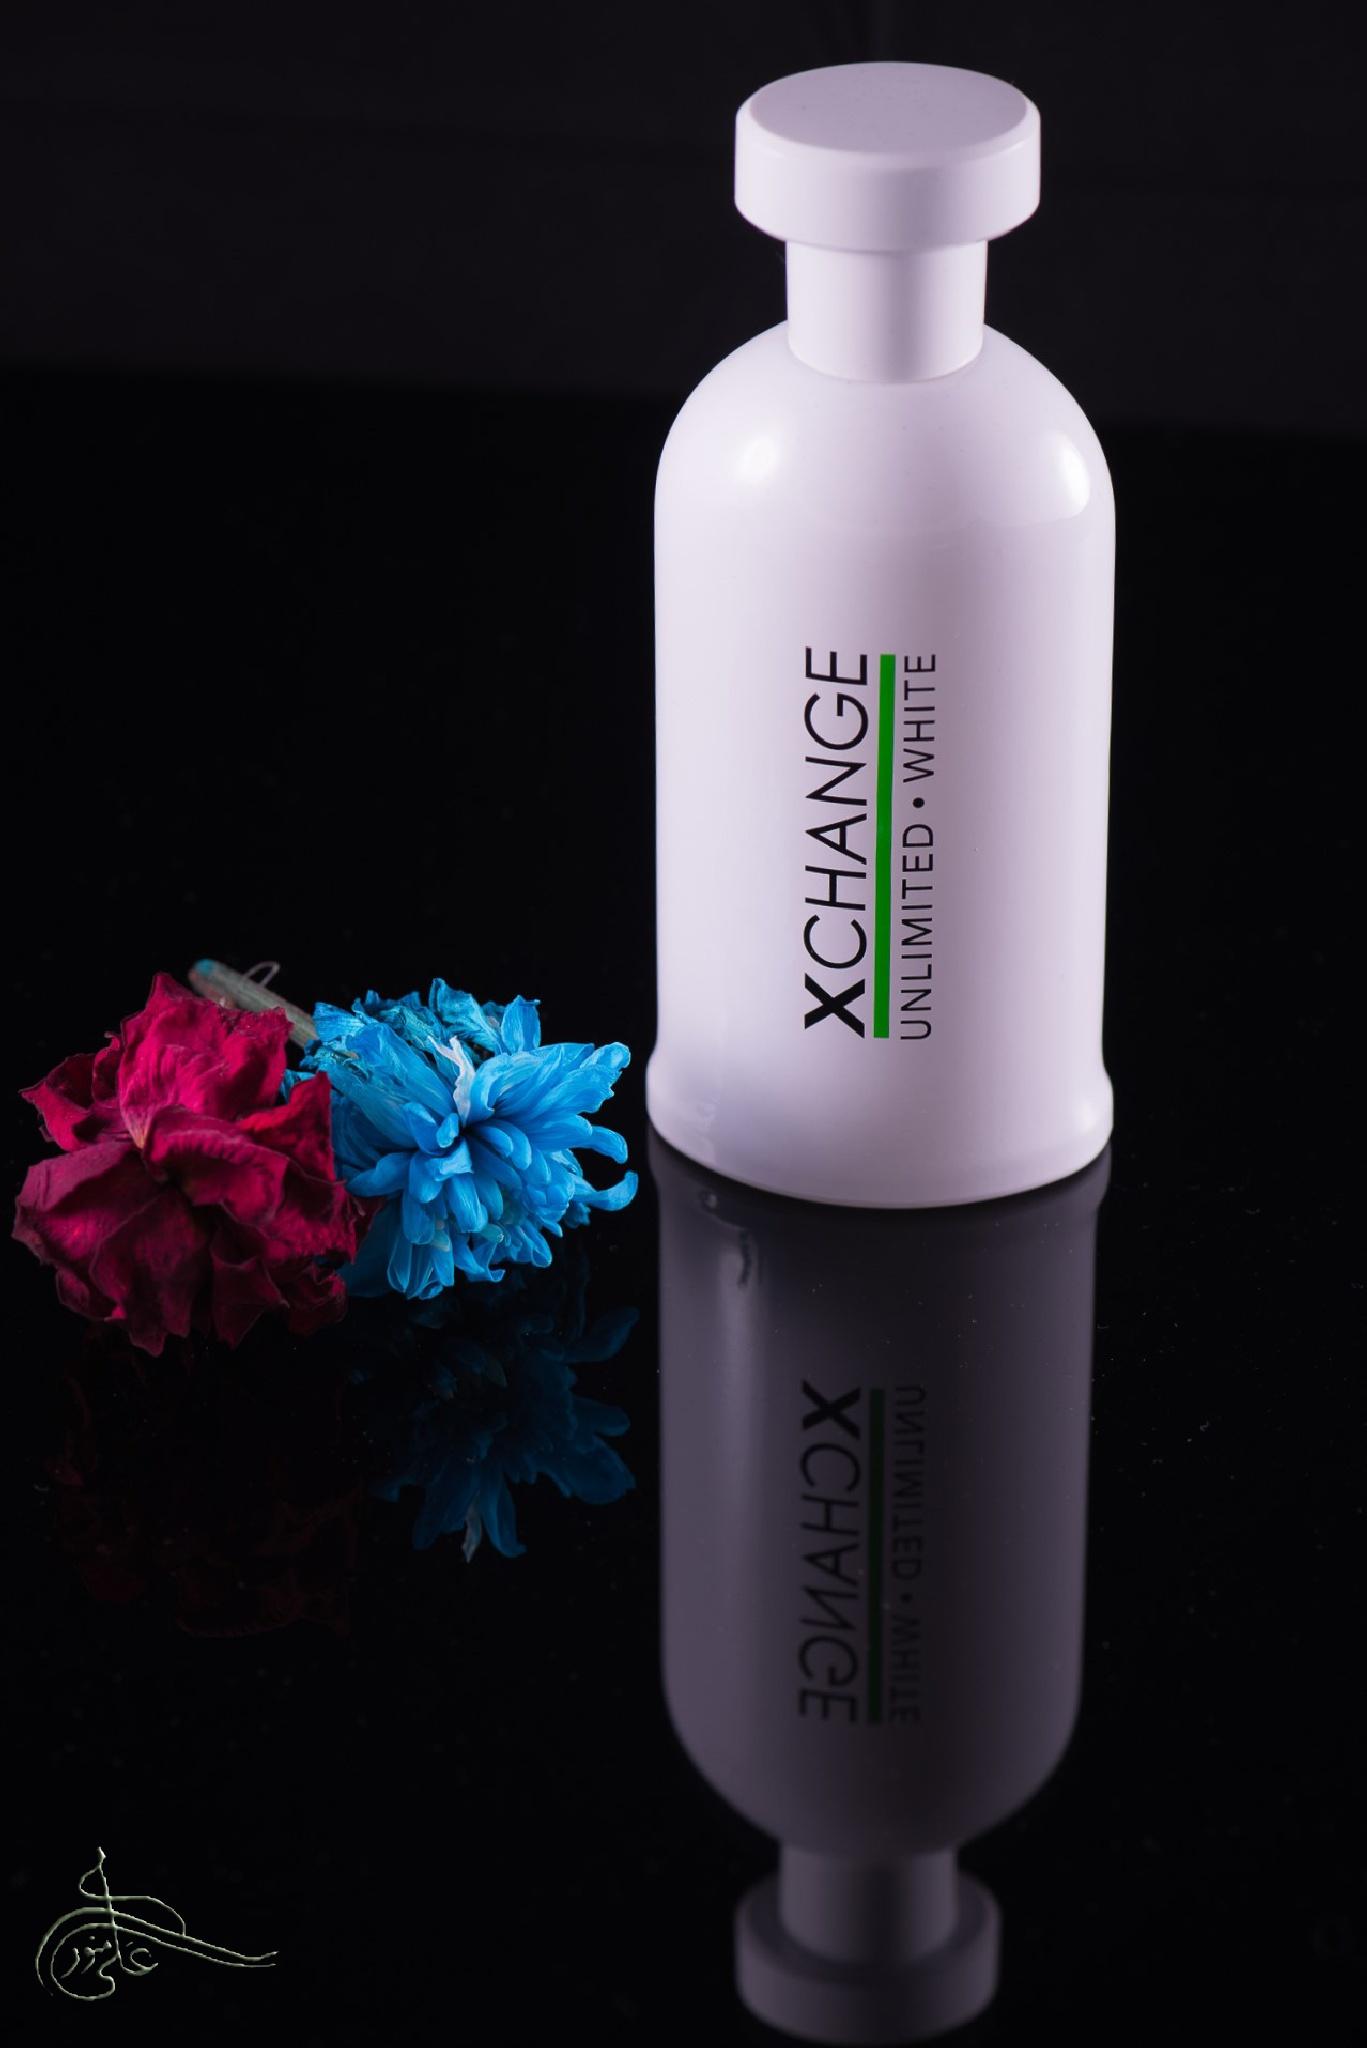 Perfume  by AliMenawar